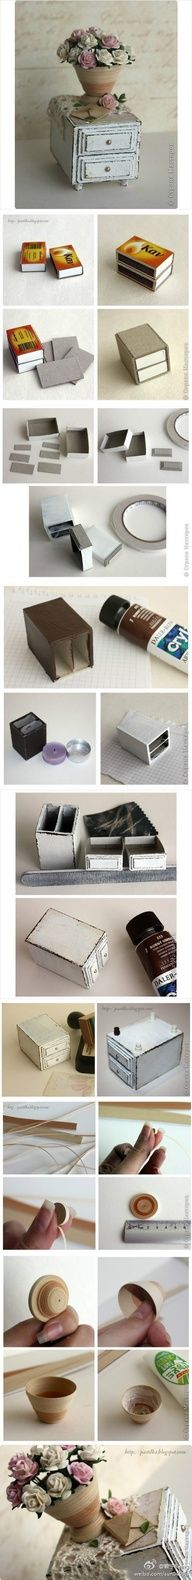 dollhouse matchbox or books